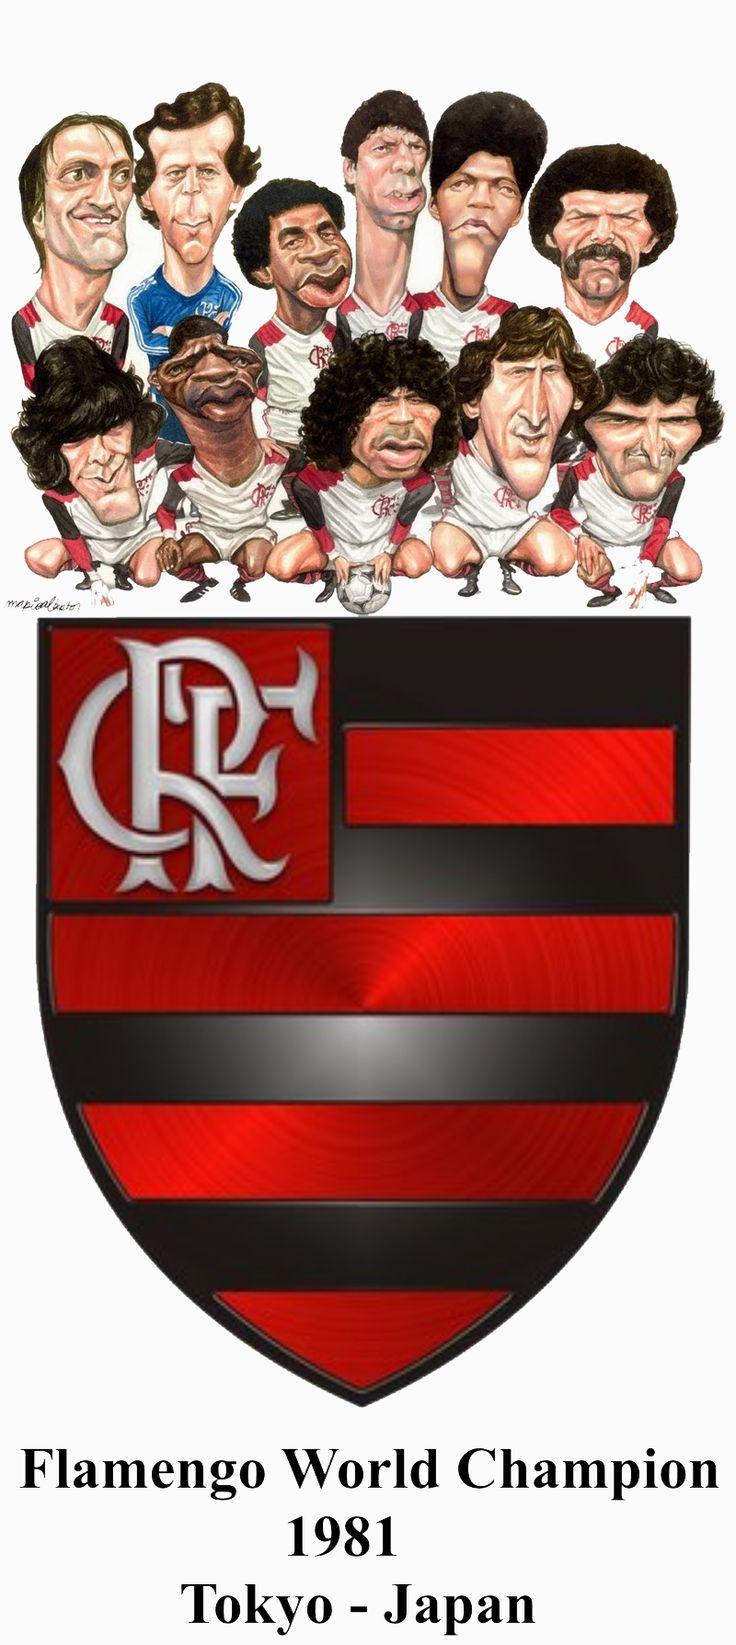 Flamengo World Champion 1981 - Tokyo, Japan - Montagem de Antônio Lídio Gomes